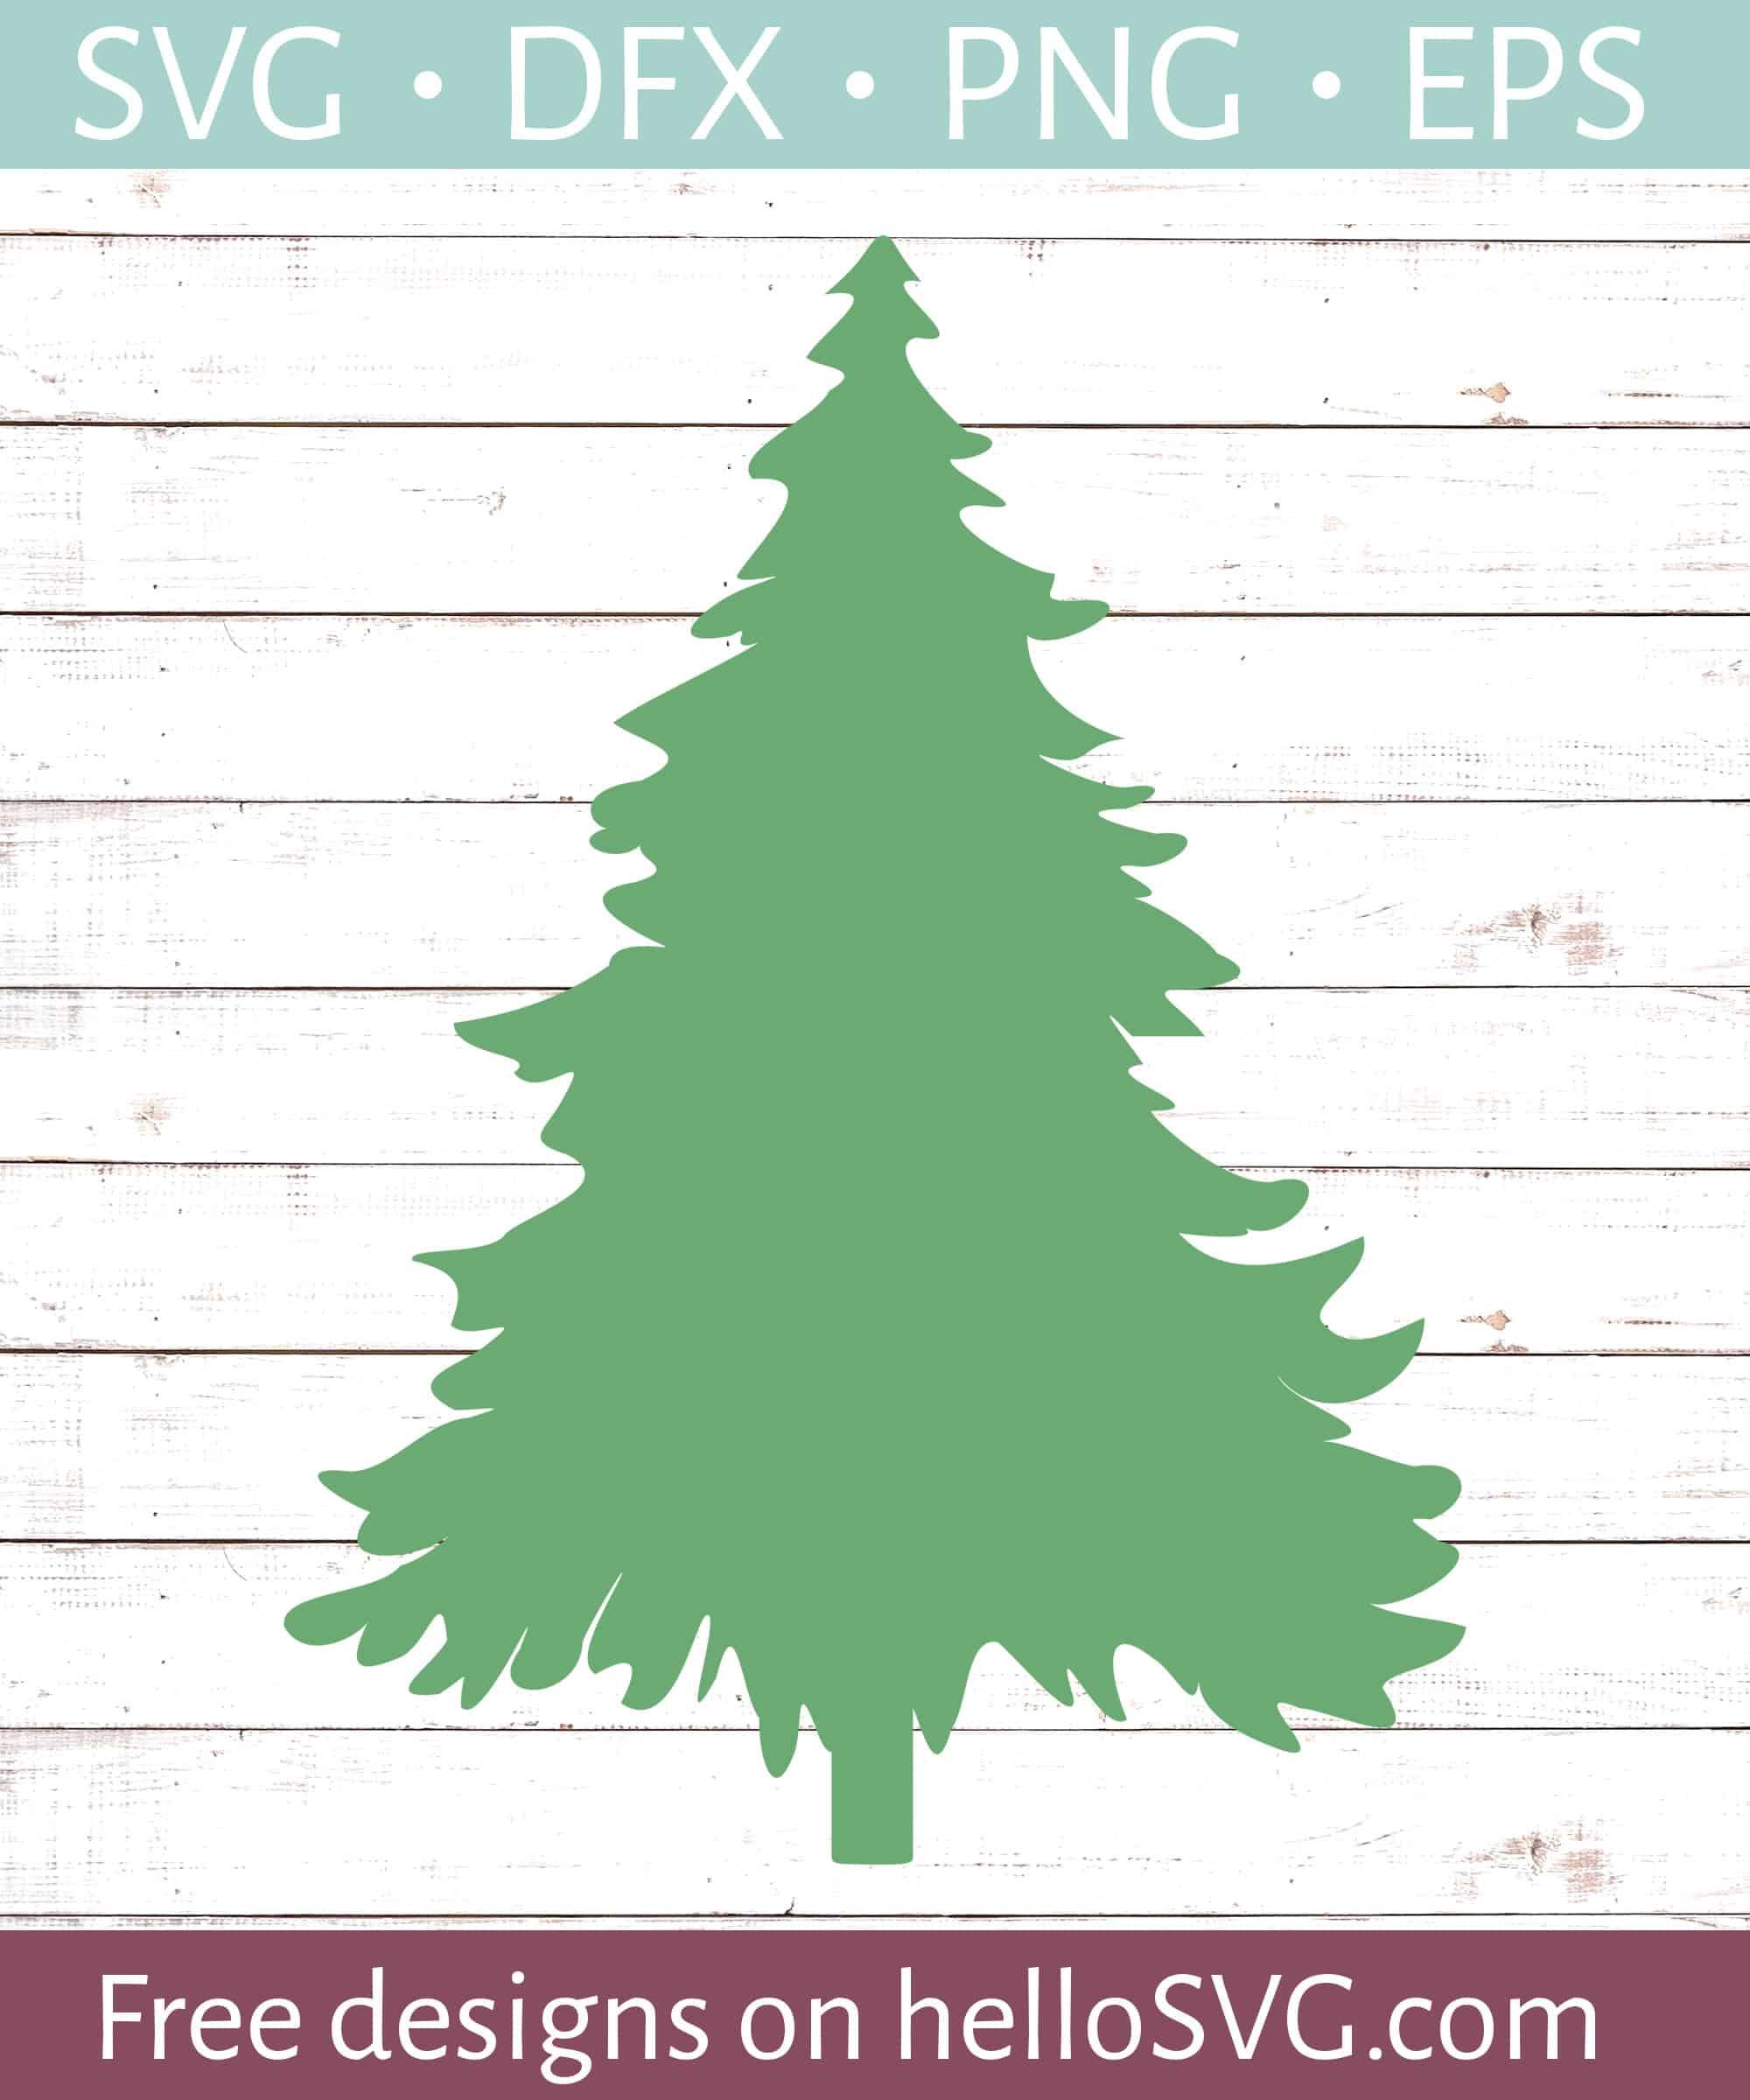 Simple Christmas Tree SVG - Free SVG files | HelloSVG.com